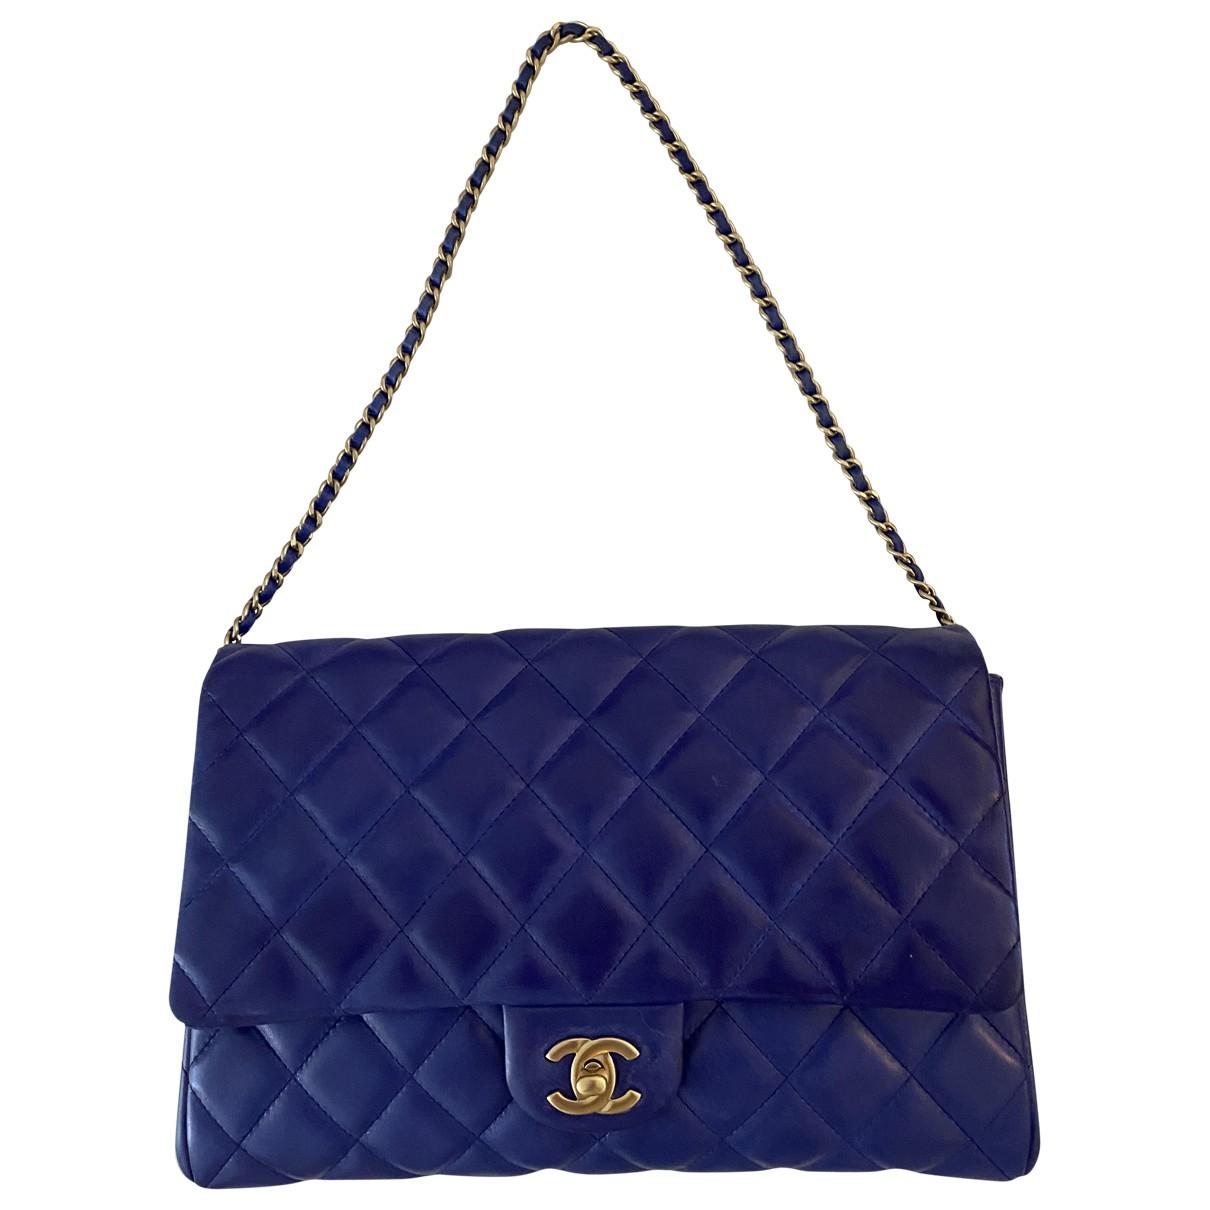 Chanel Timeless/Classique Handtasche in  Blau Leder